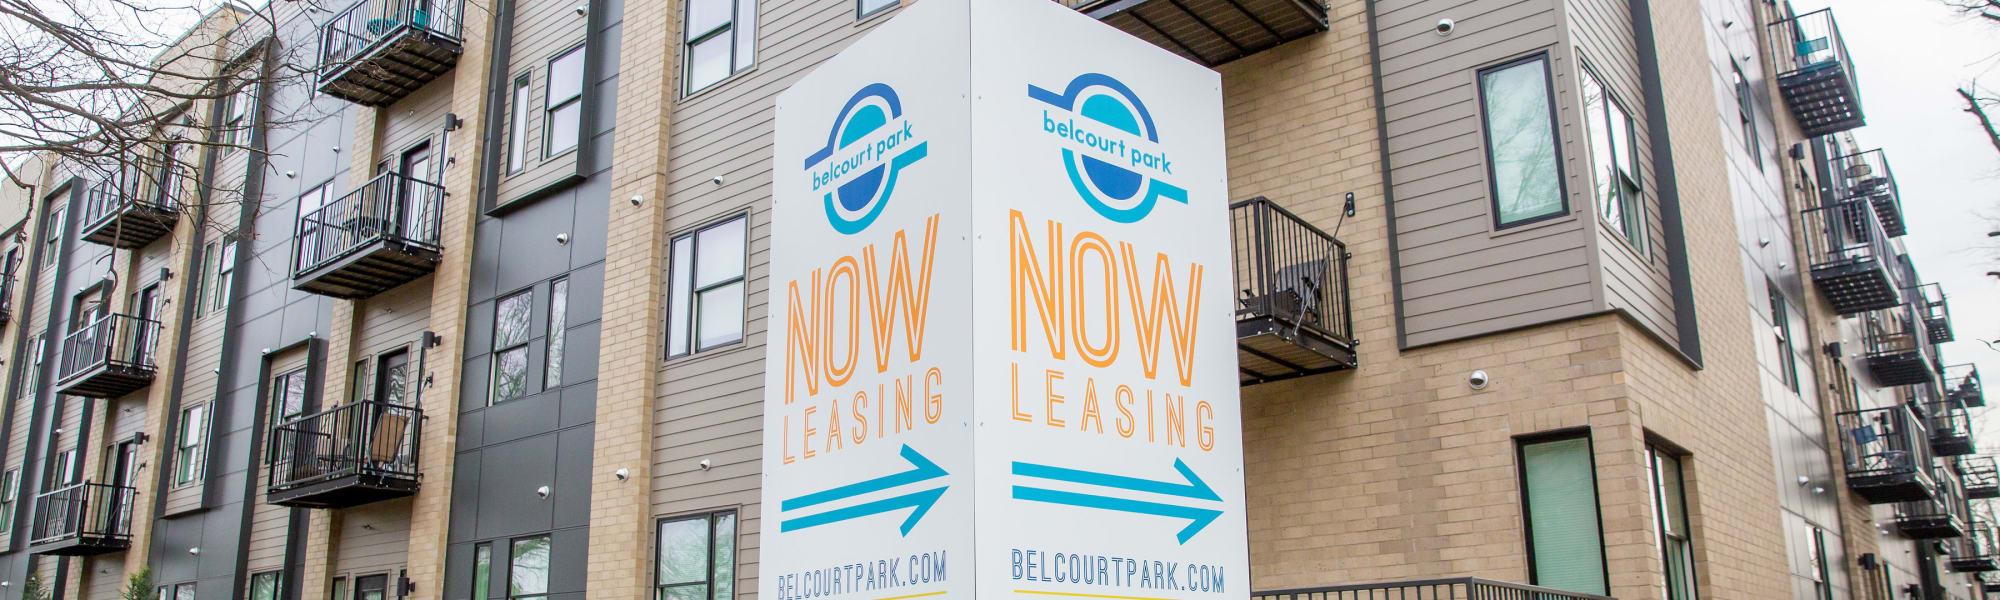 Apply online to Belcourt Park in Nashville, Tennessee